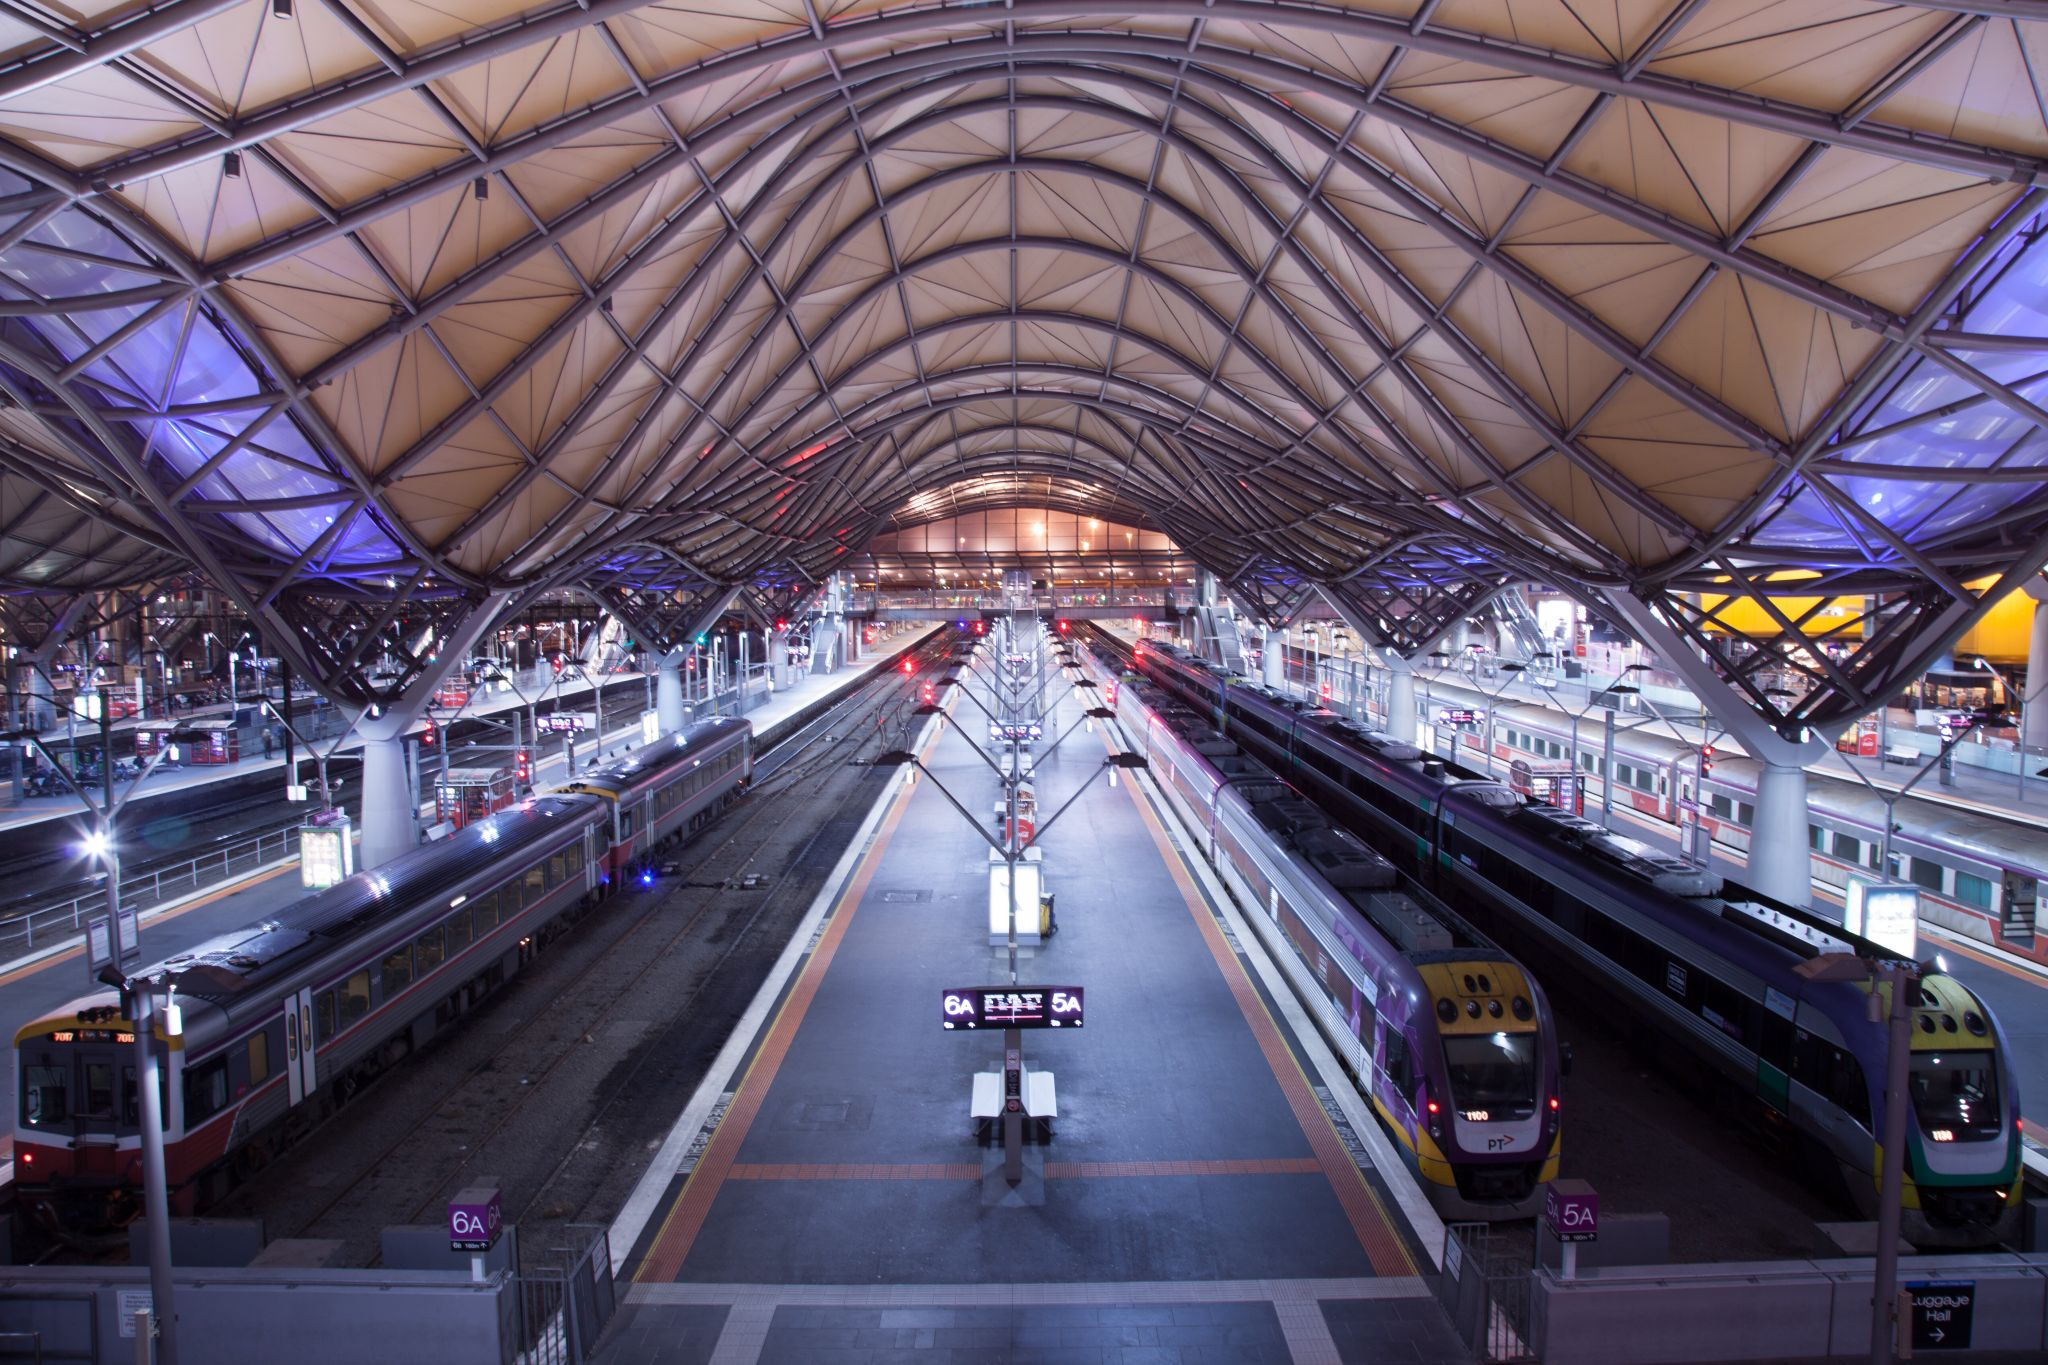 Southern Cross Train Station Melbourne, Australia